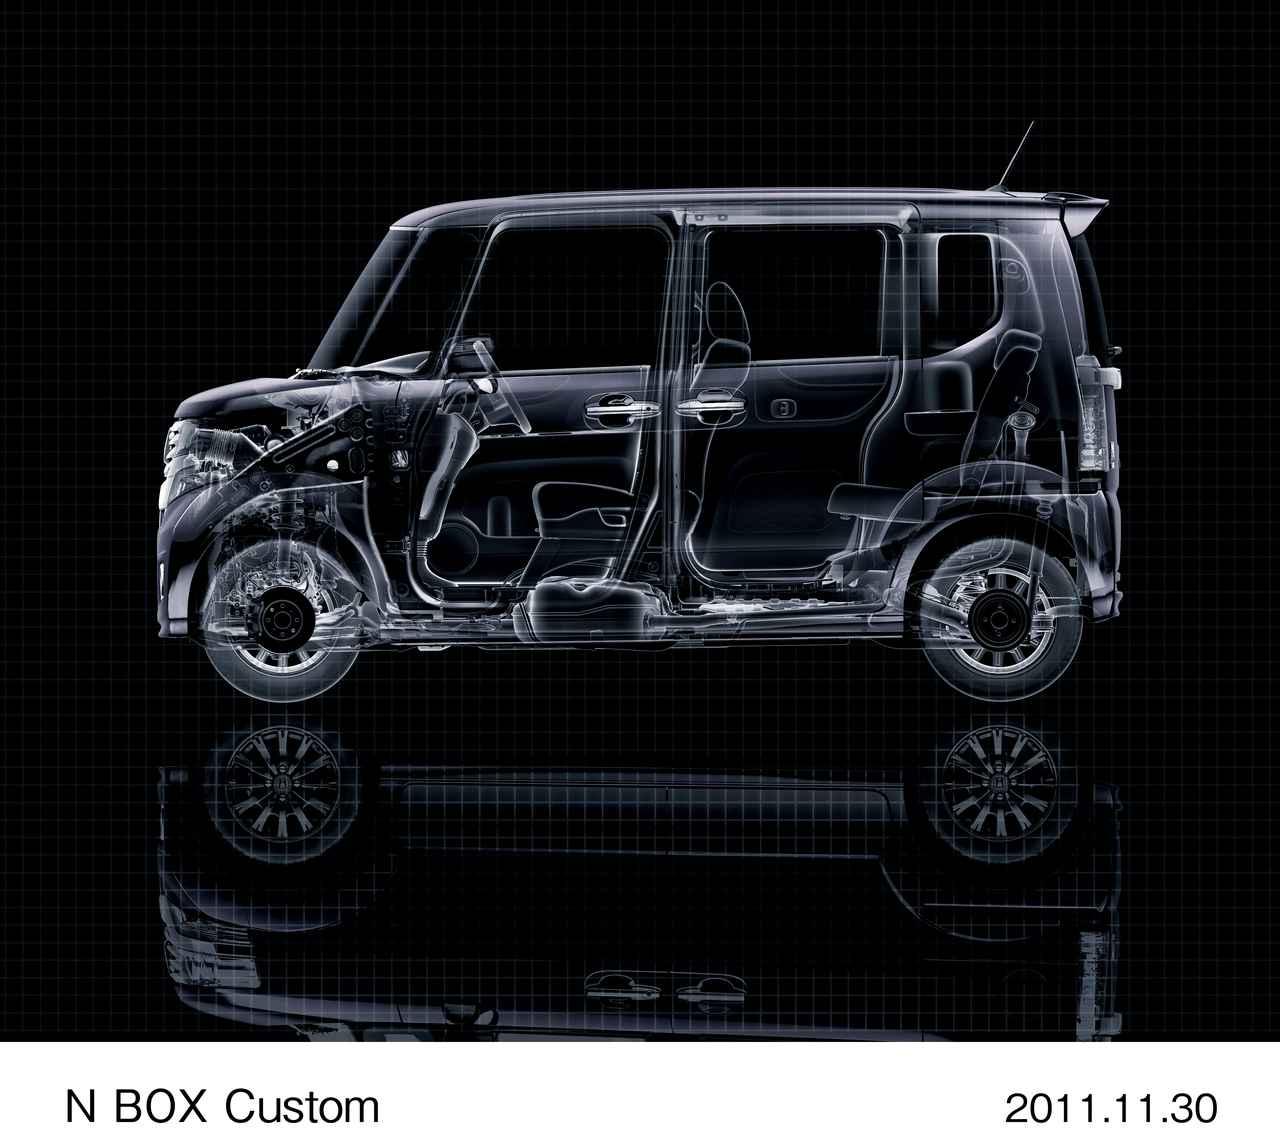 Images : 2番目の画像 - ホンダマチック関連の画像はこちら(クリックして拡大) - A Little Honda | ア・リトル・ホンダ(リトホン)